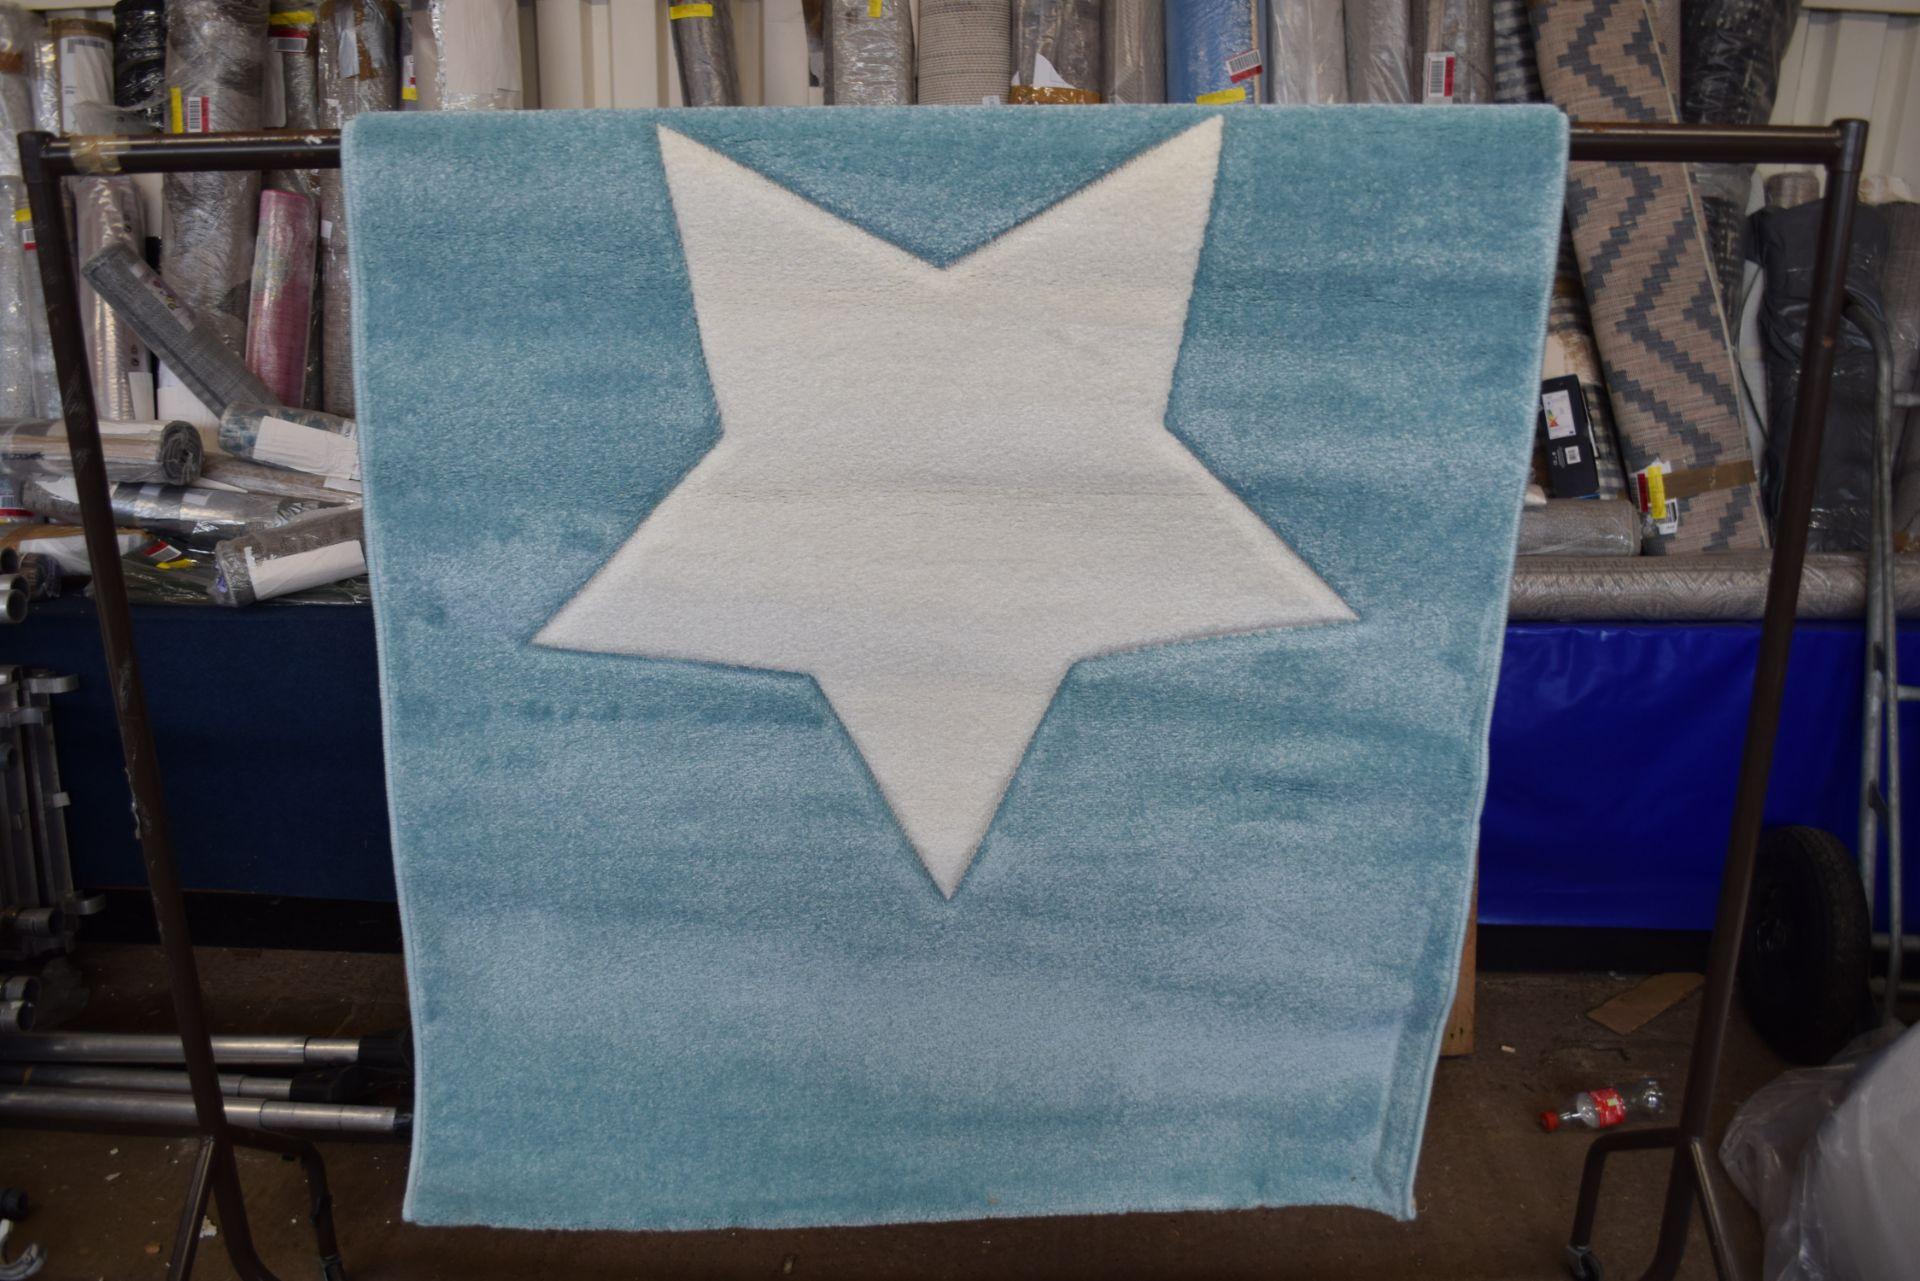 Isabel & Max Benjamin blue rug, 120 x 170cm RRP £65.99 - Image 3 of 3